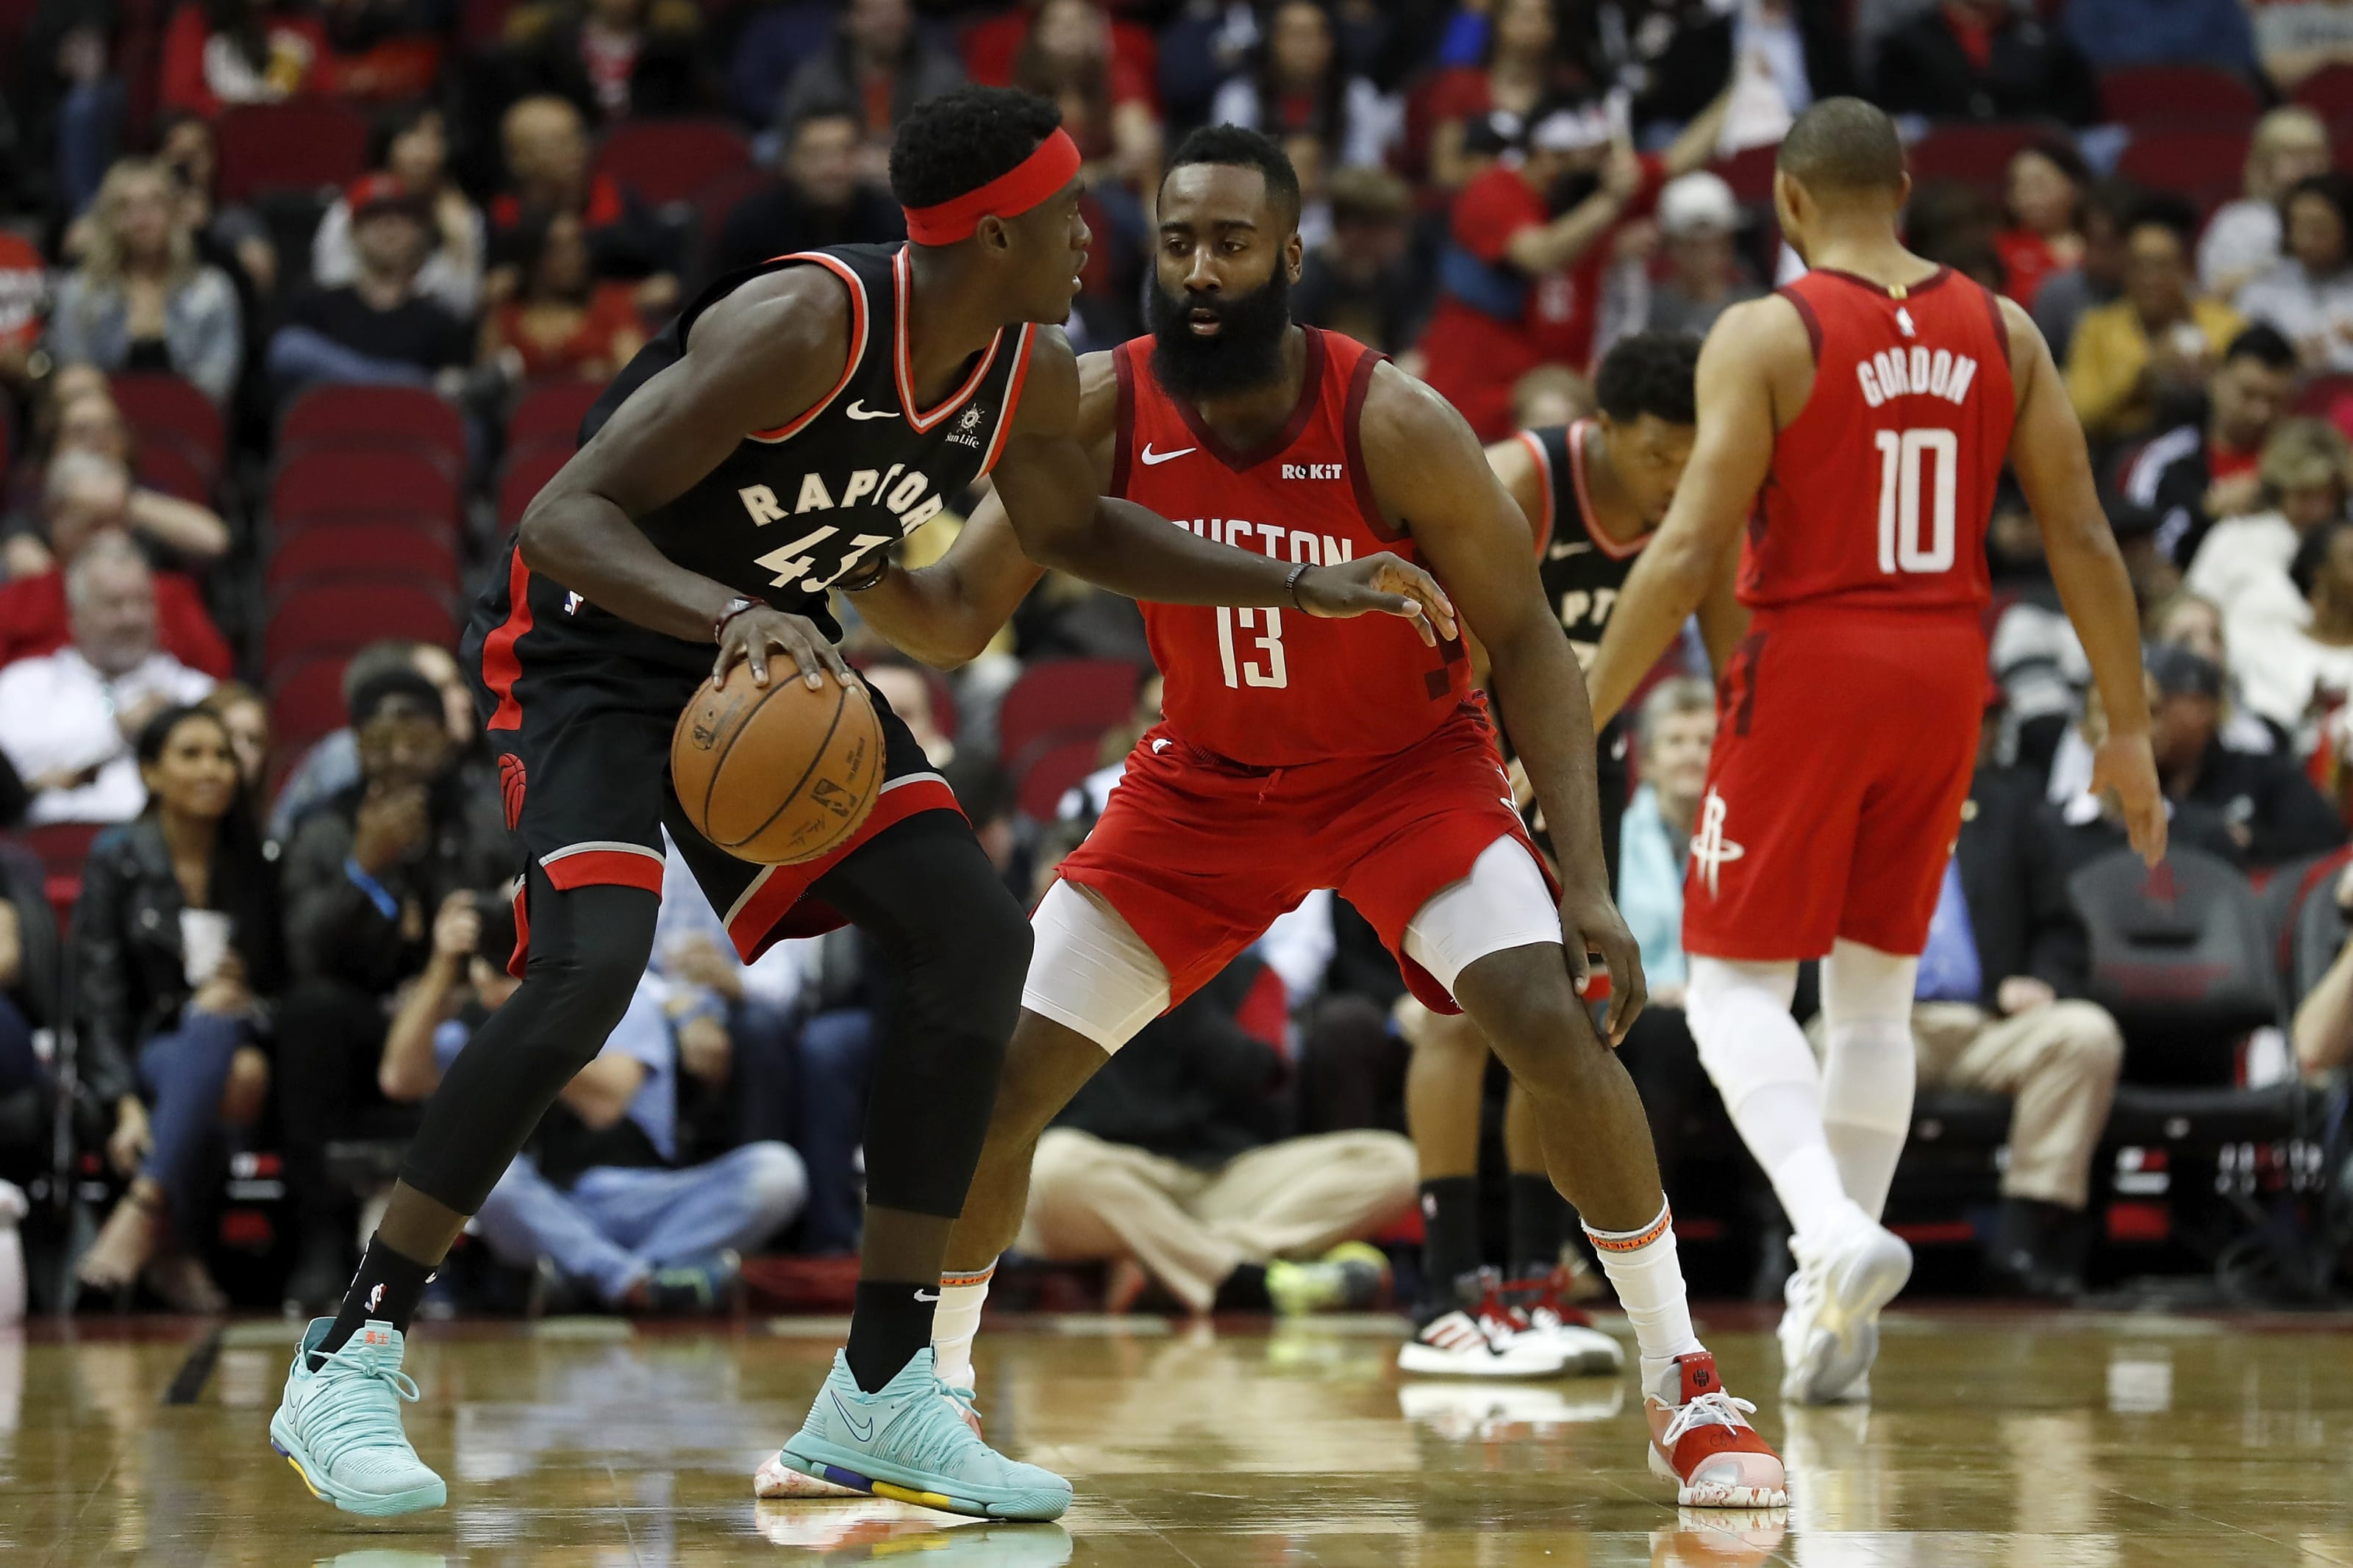 Toronto Raptors: Pascal Siakam, Houston Rockets: James Harden, Eric Gordon